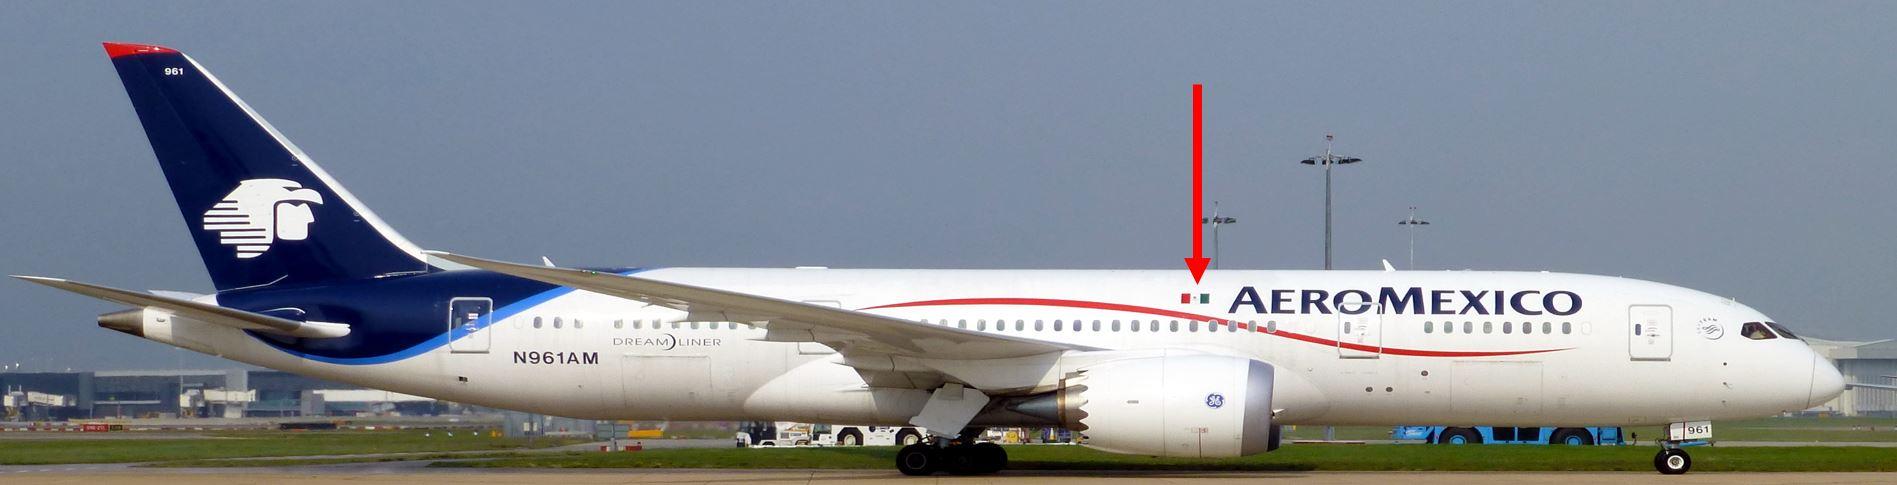 Aeromexico Backwards.JPG